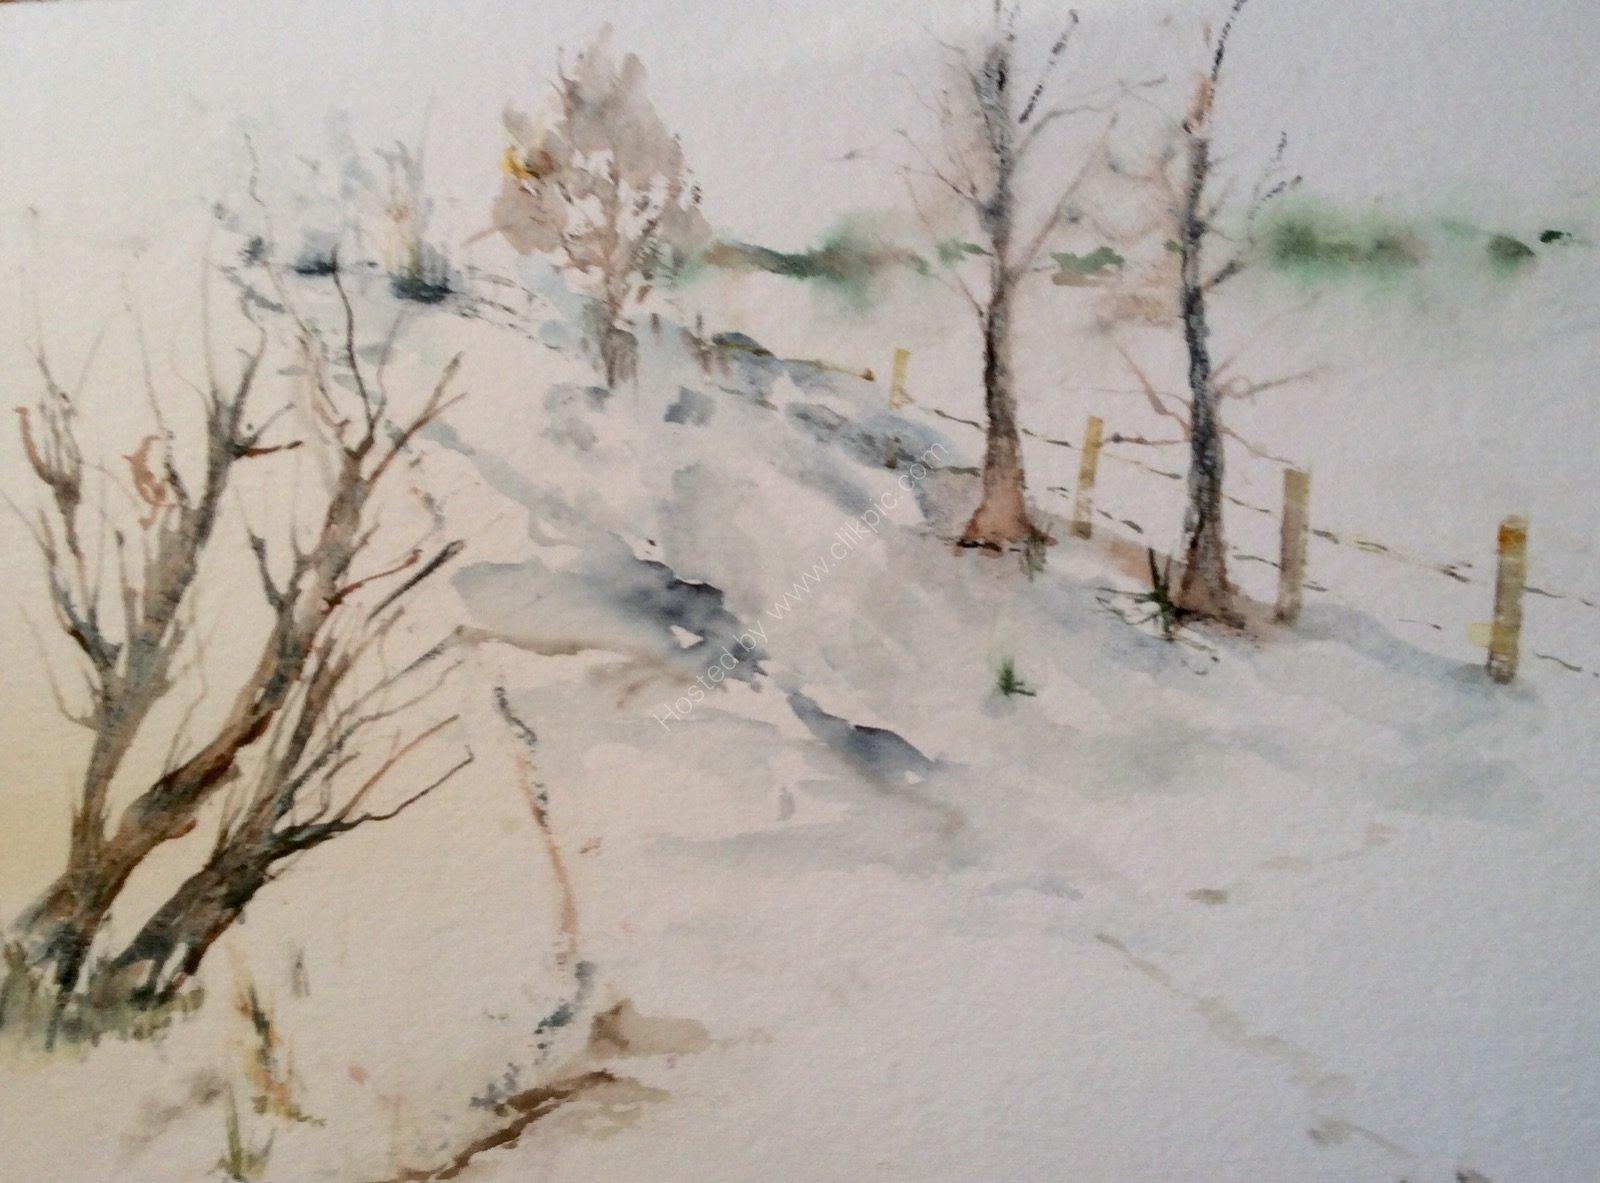 Down the lane snow is glistening